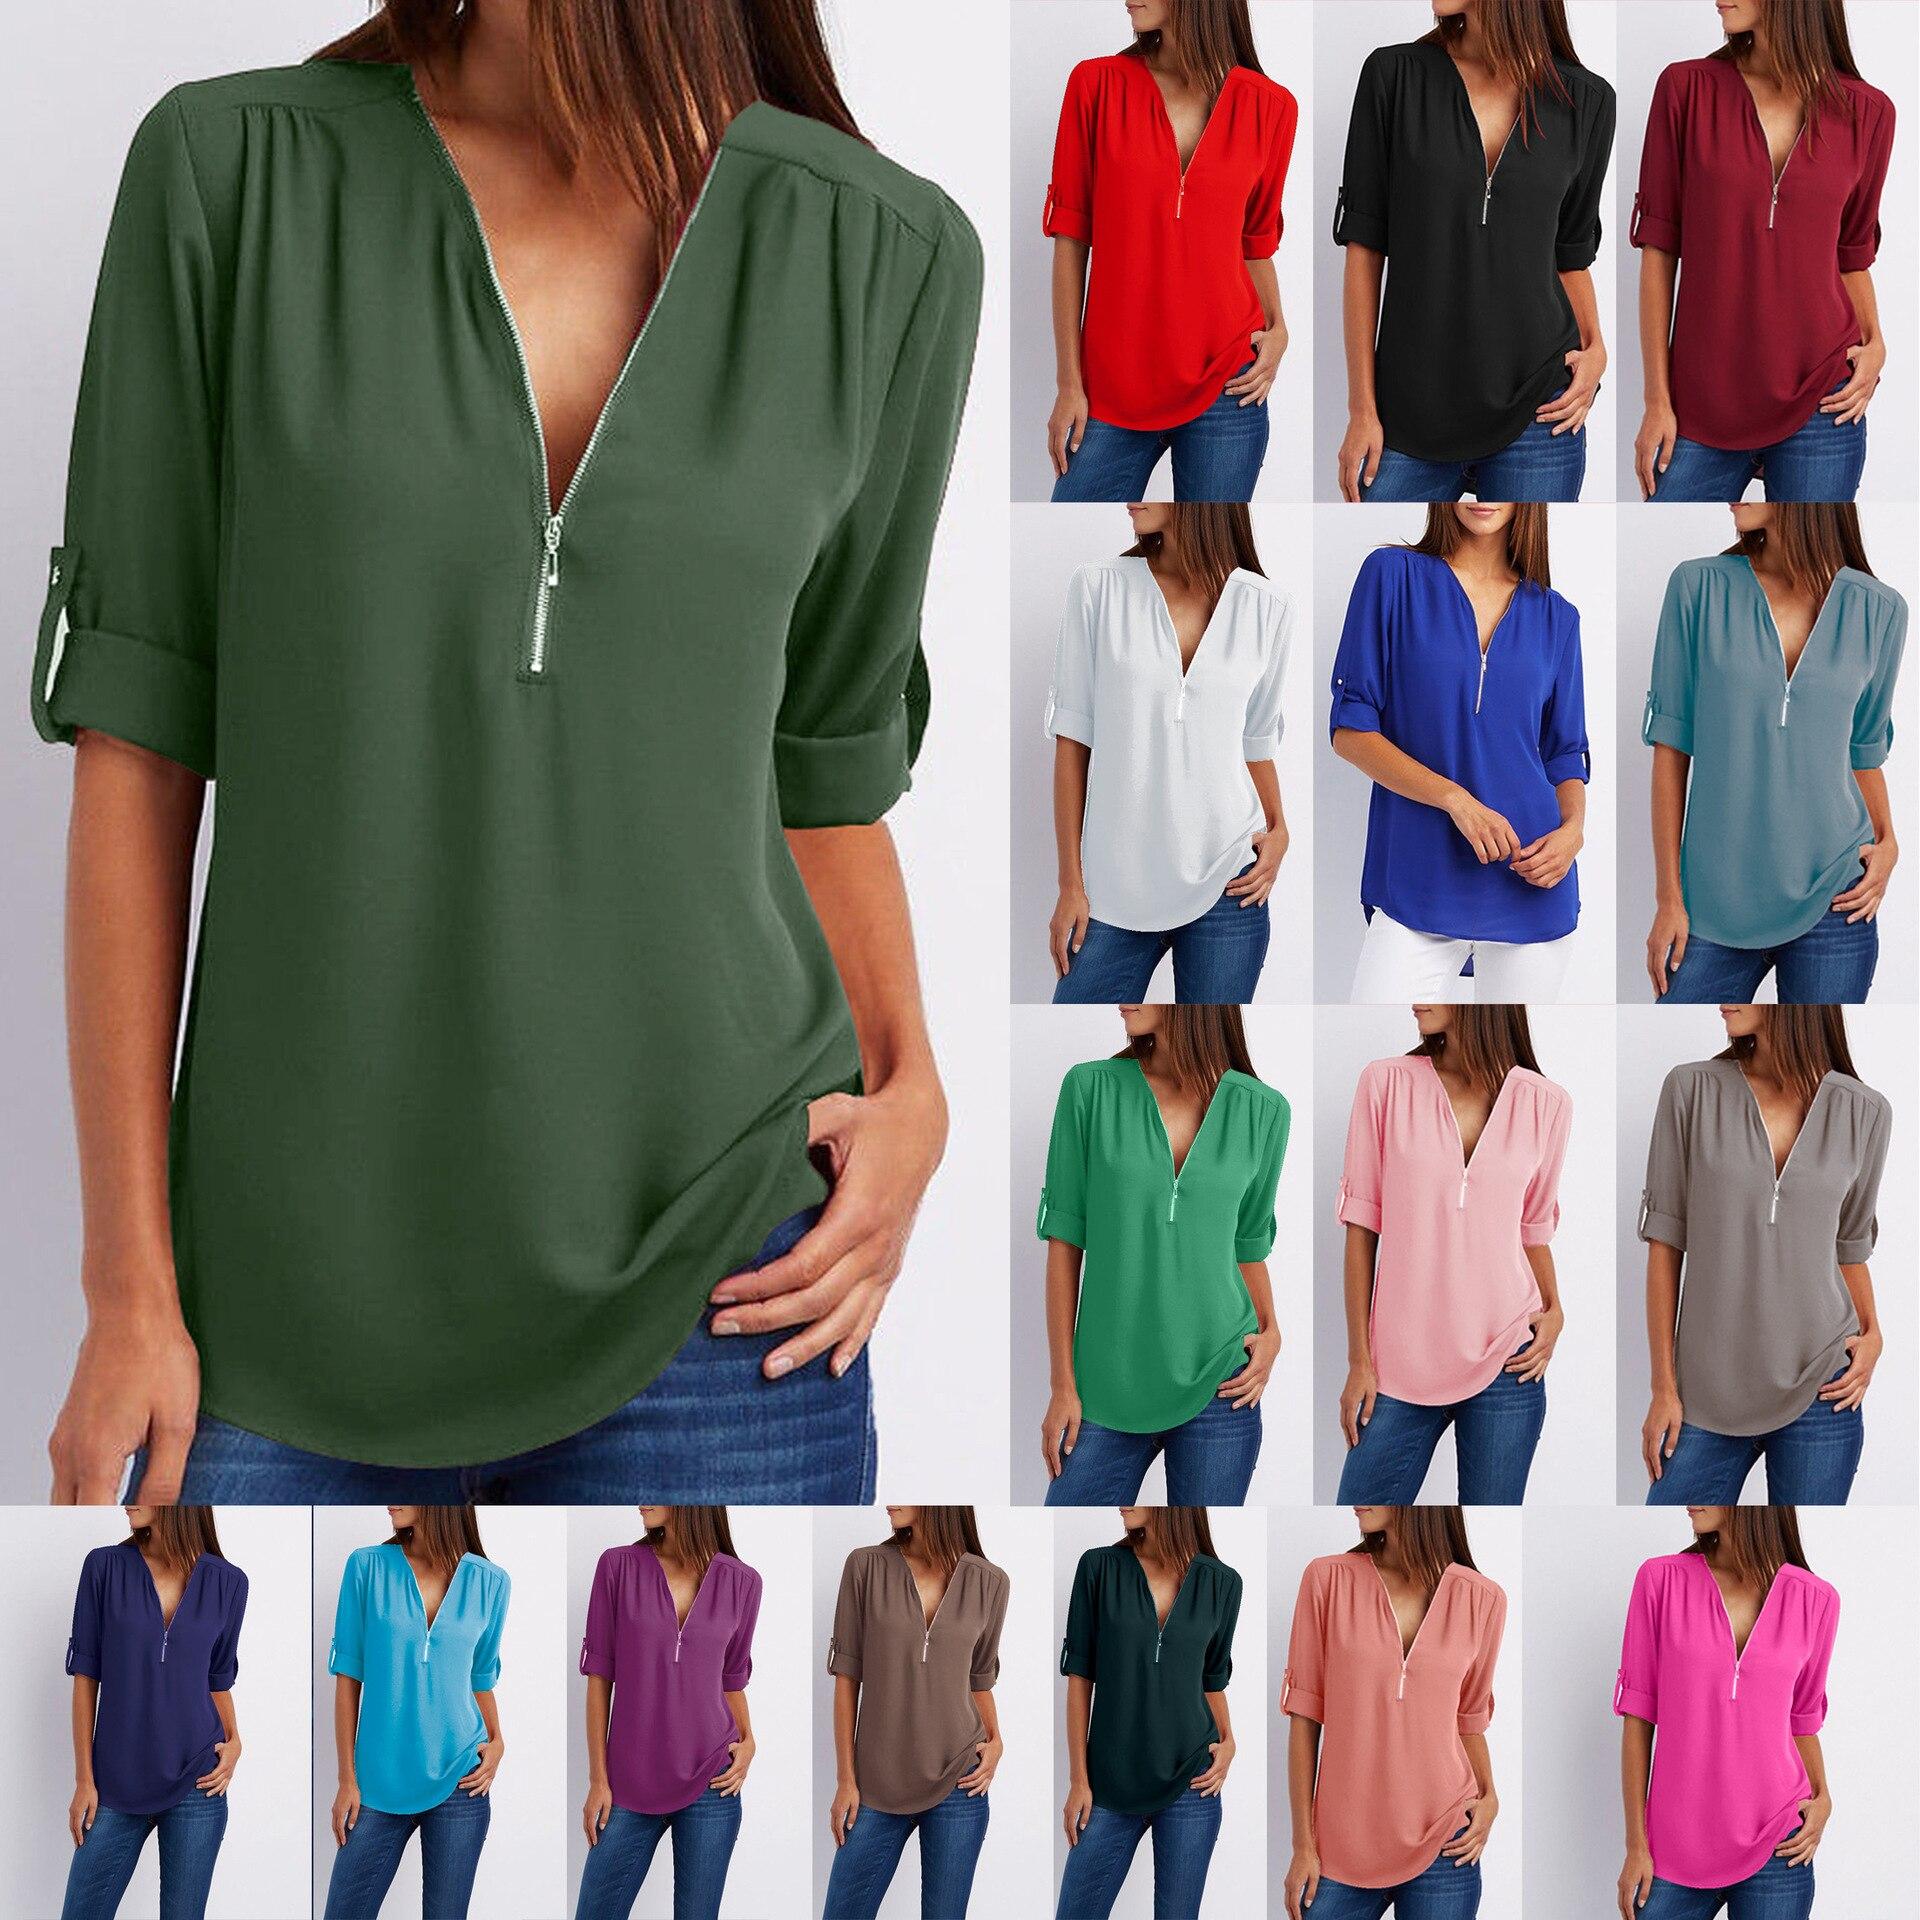 Las mujeres Blusa Europa caliente estilo de cuello en V cremallera manga larga brazaletes suelto prenda superior sin forro Blusa femenina Vestidos YFF6186